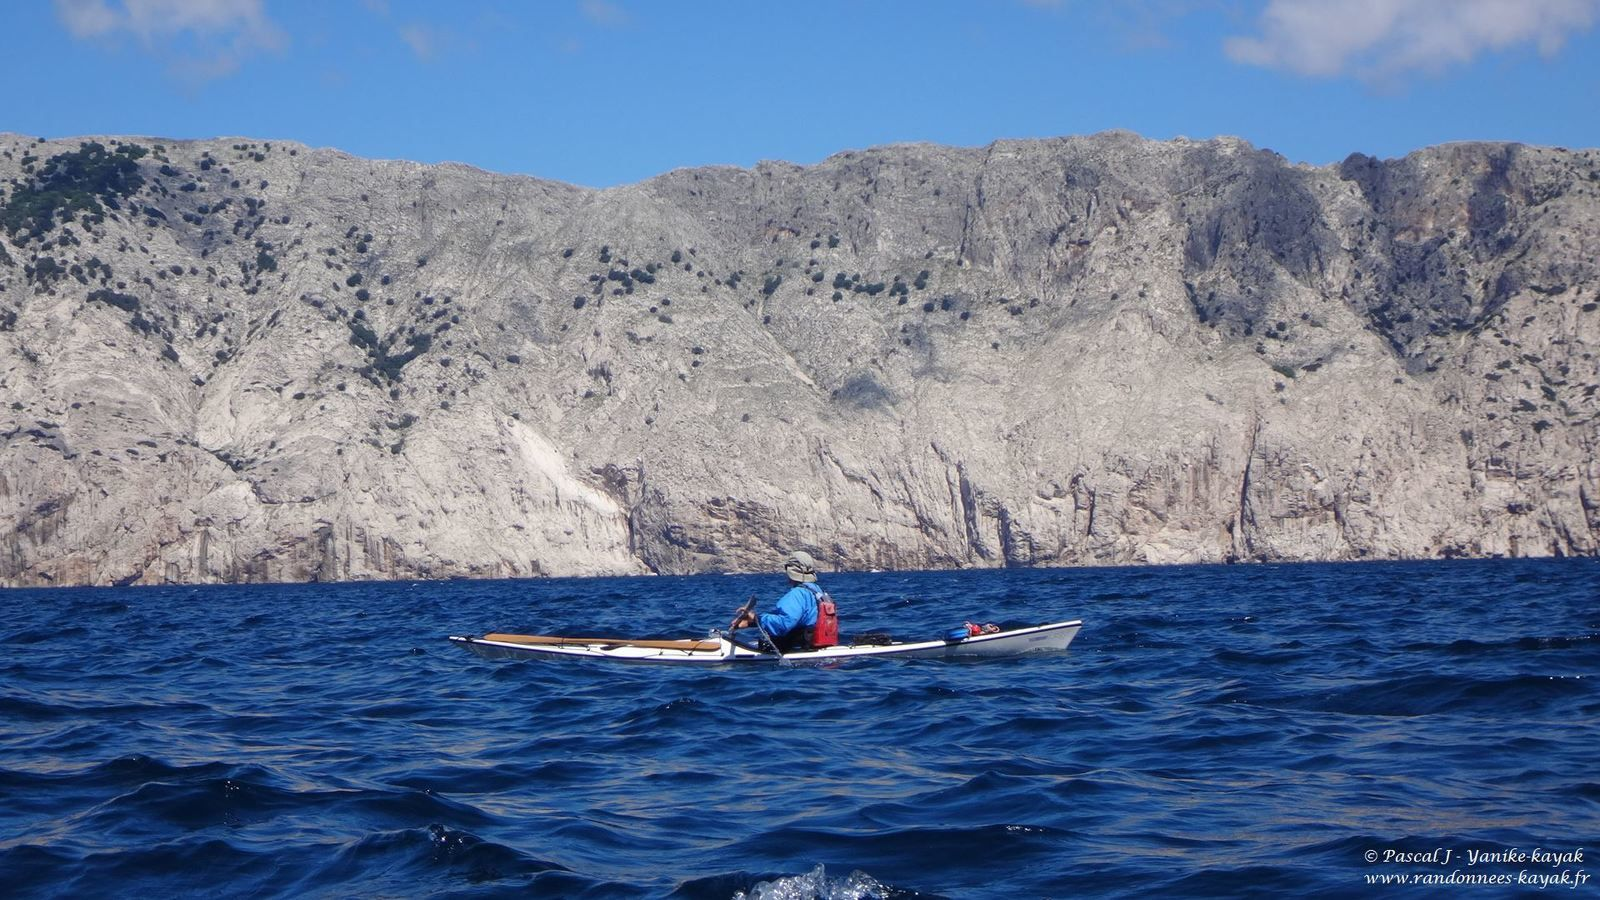 Sardegna 2019, una nuova avventura - Chapitre 10 - Isola Molara